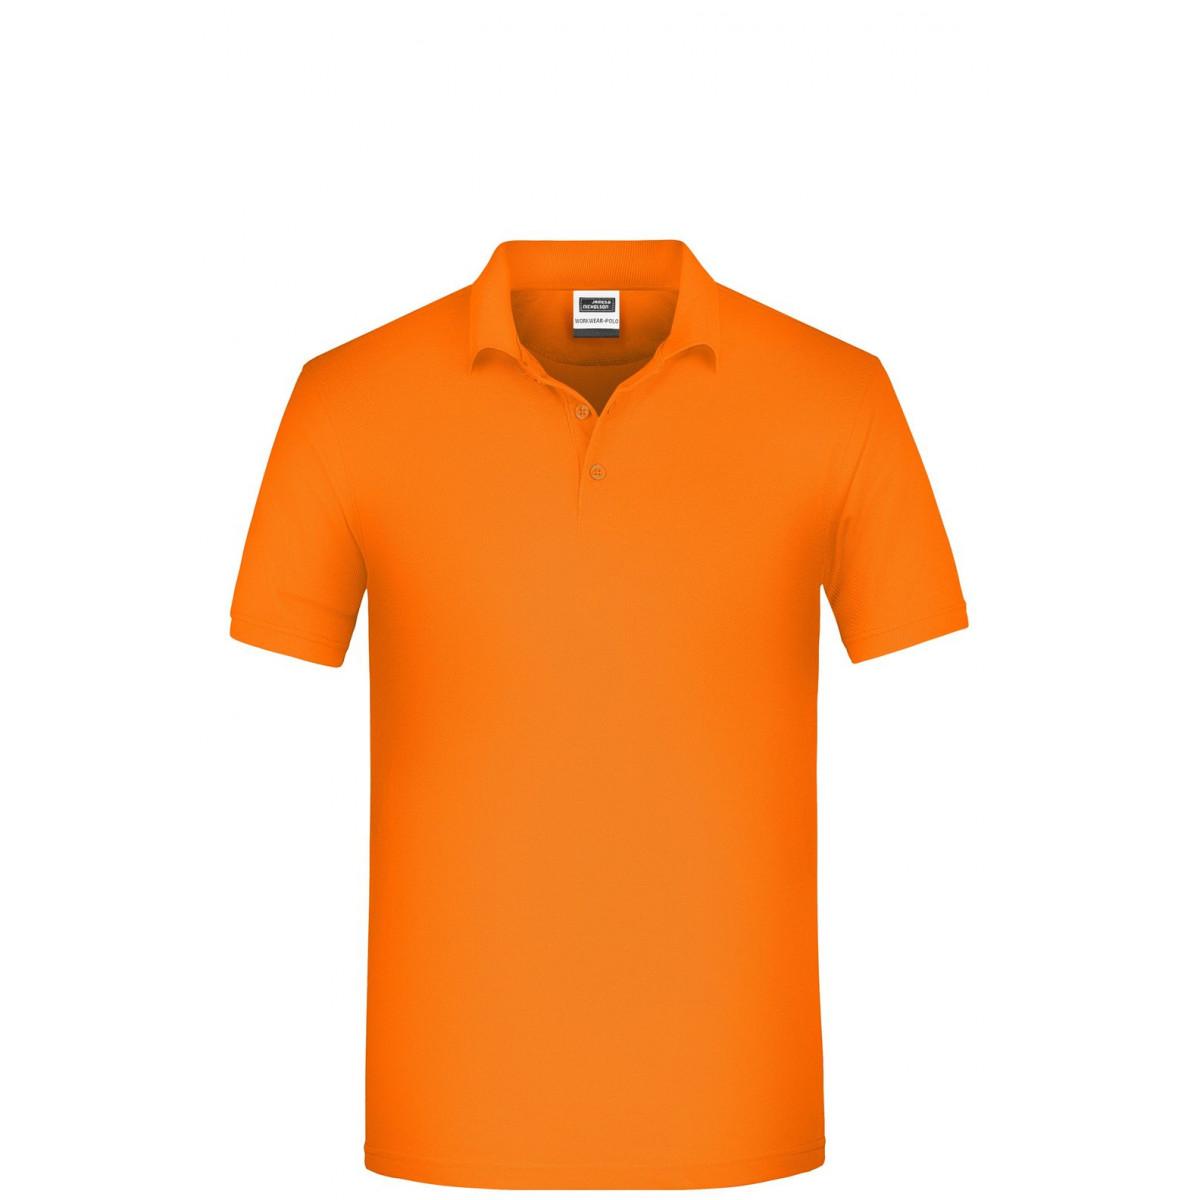 Рубашка поло мужская JN874 Mens BIO Workwear Polo - Оранжевый